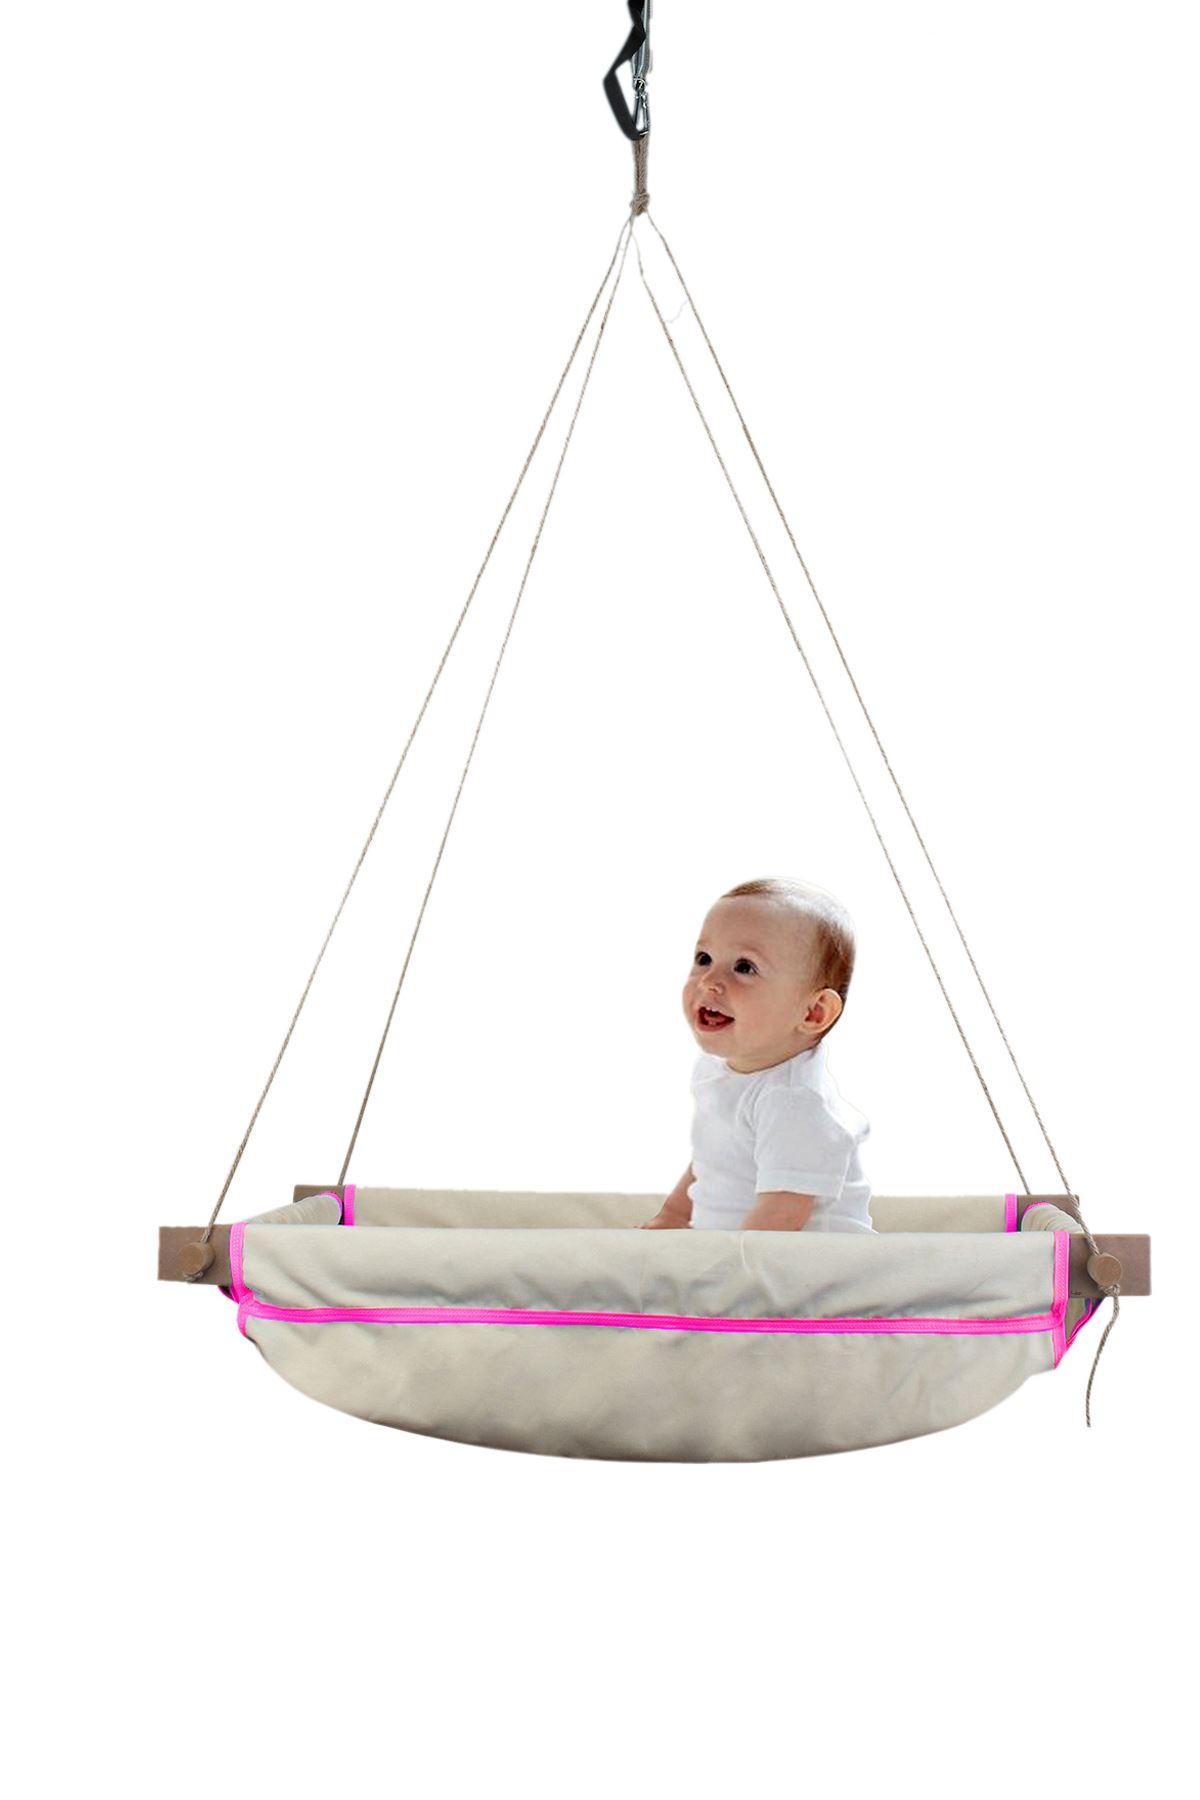 Girl Boy Child Teenager Wooden Baby Sleeping Crib Hammock Babies Toy Garden Camping Rope Swing Chair Fashion Home Fun Activity